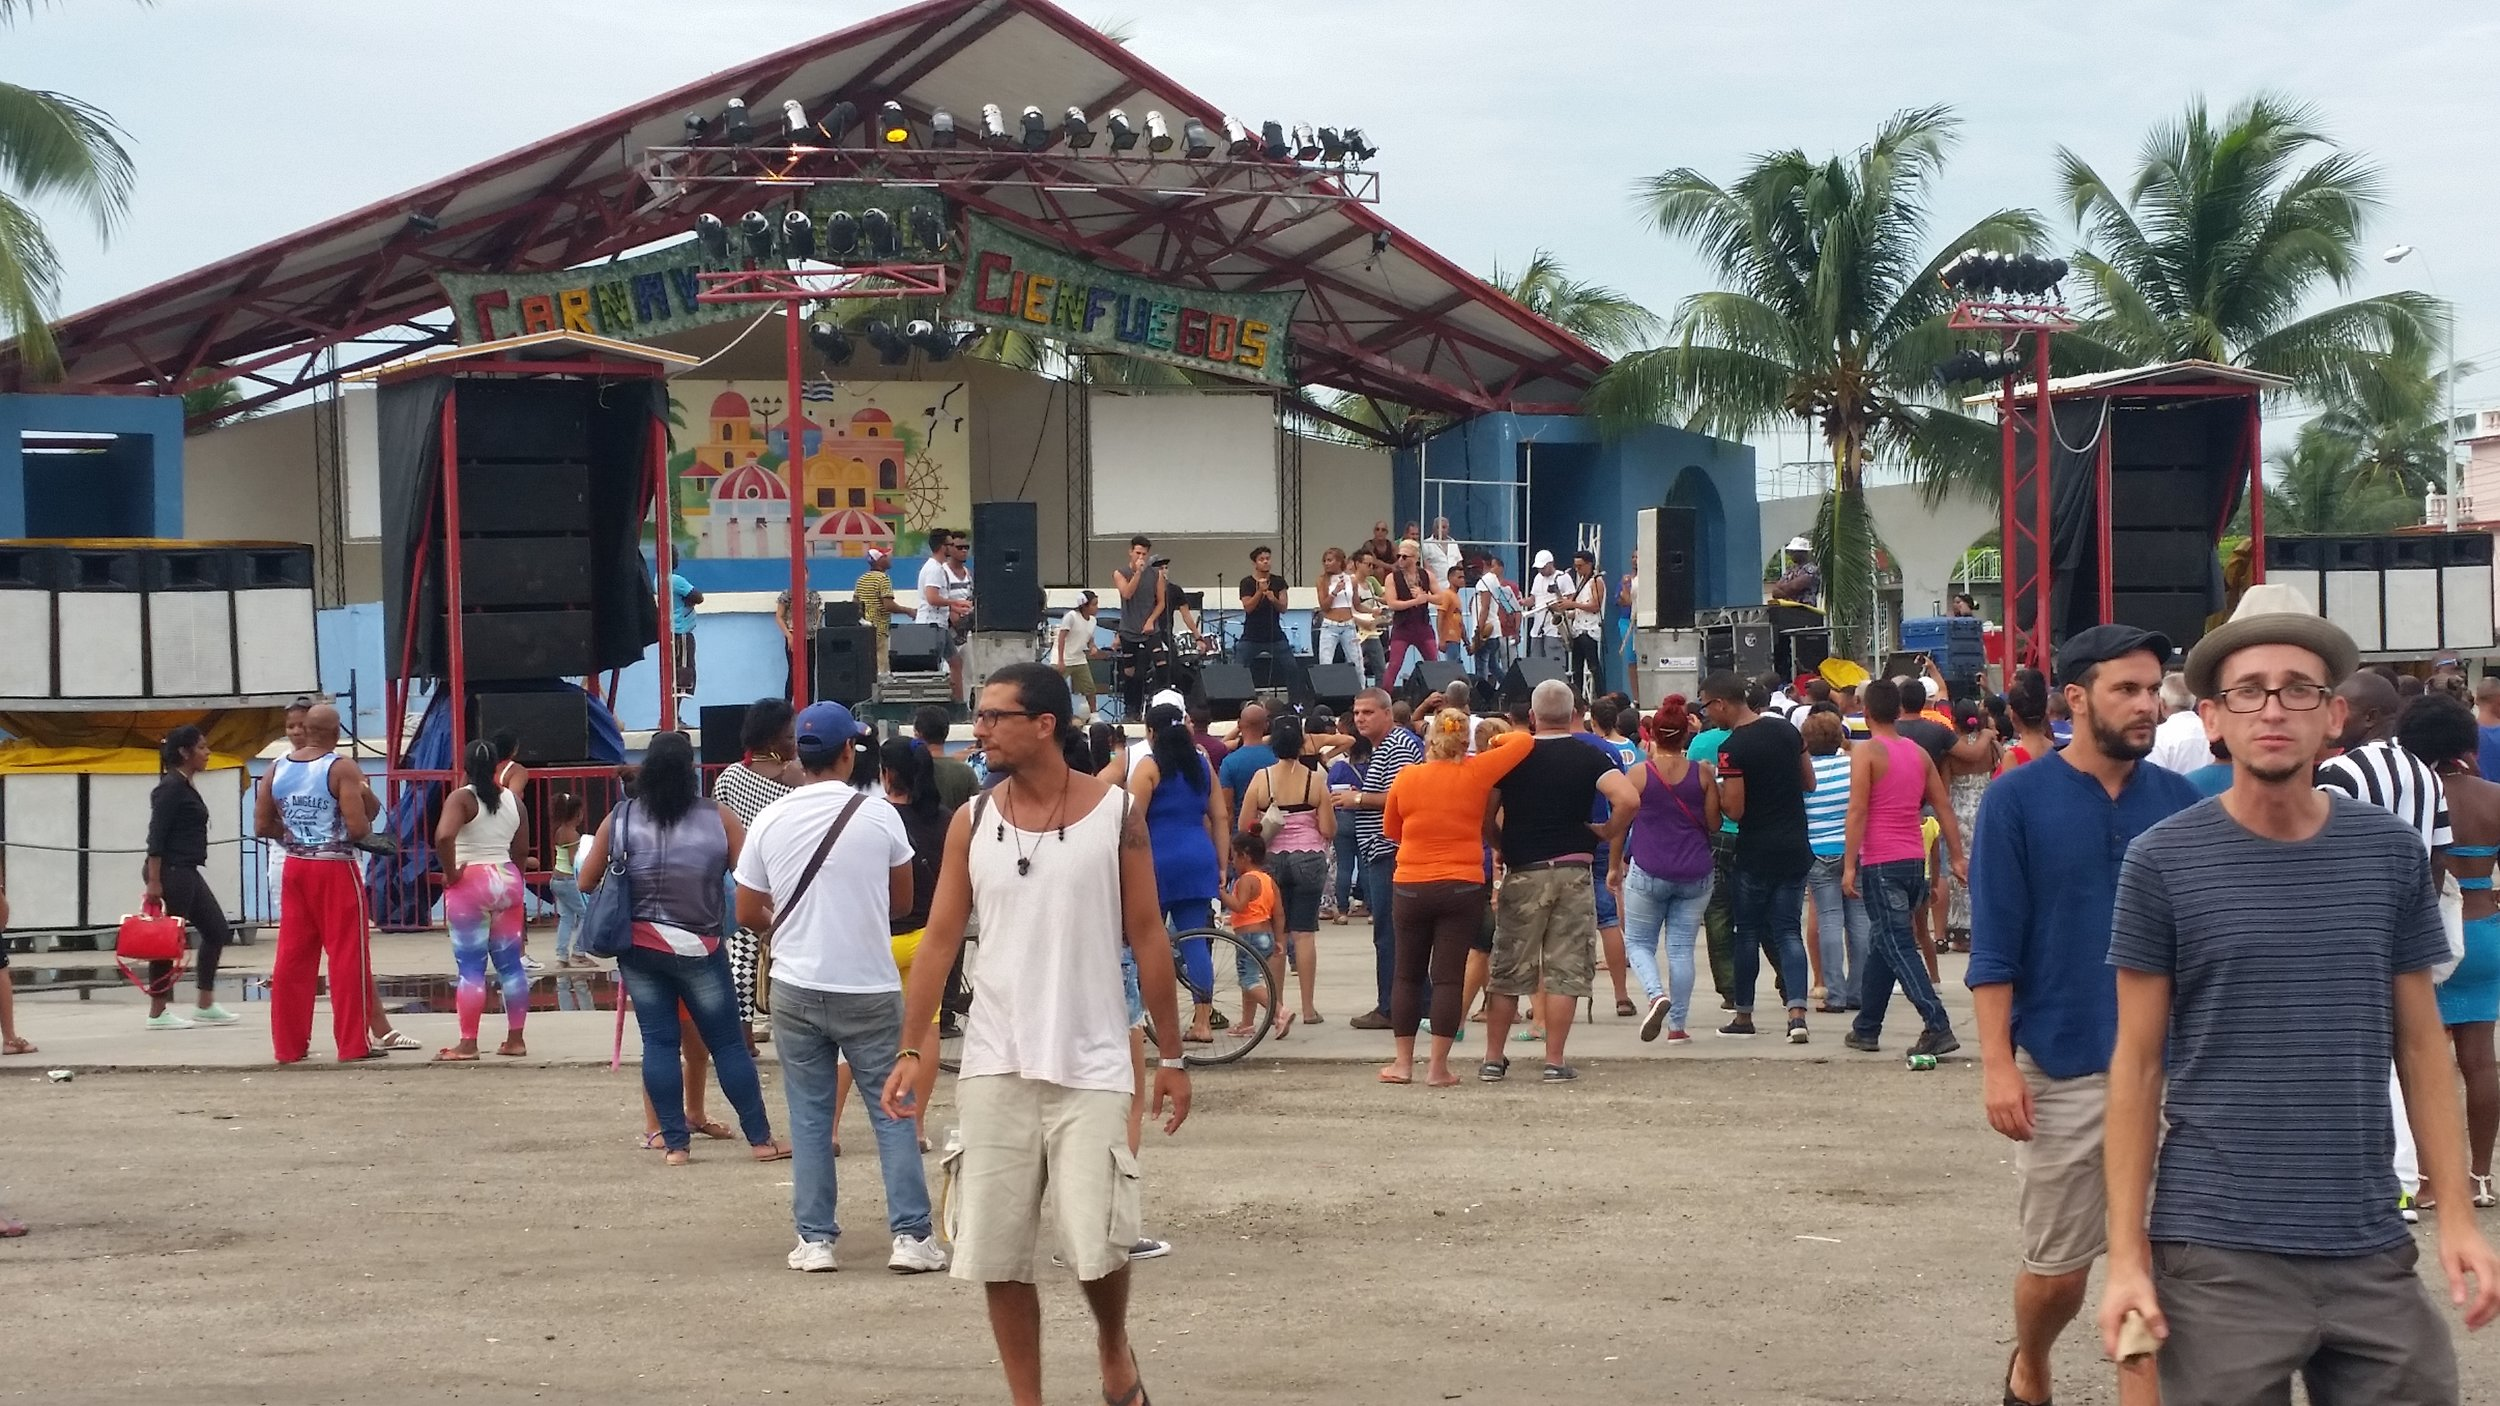 concert at the the fiesta for fidel castro's 90th